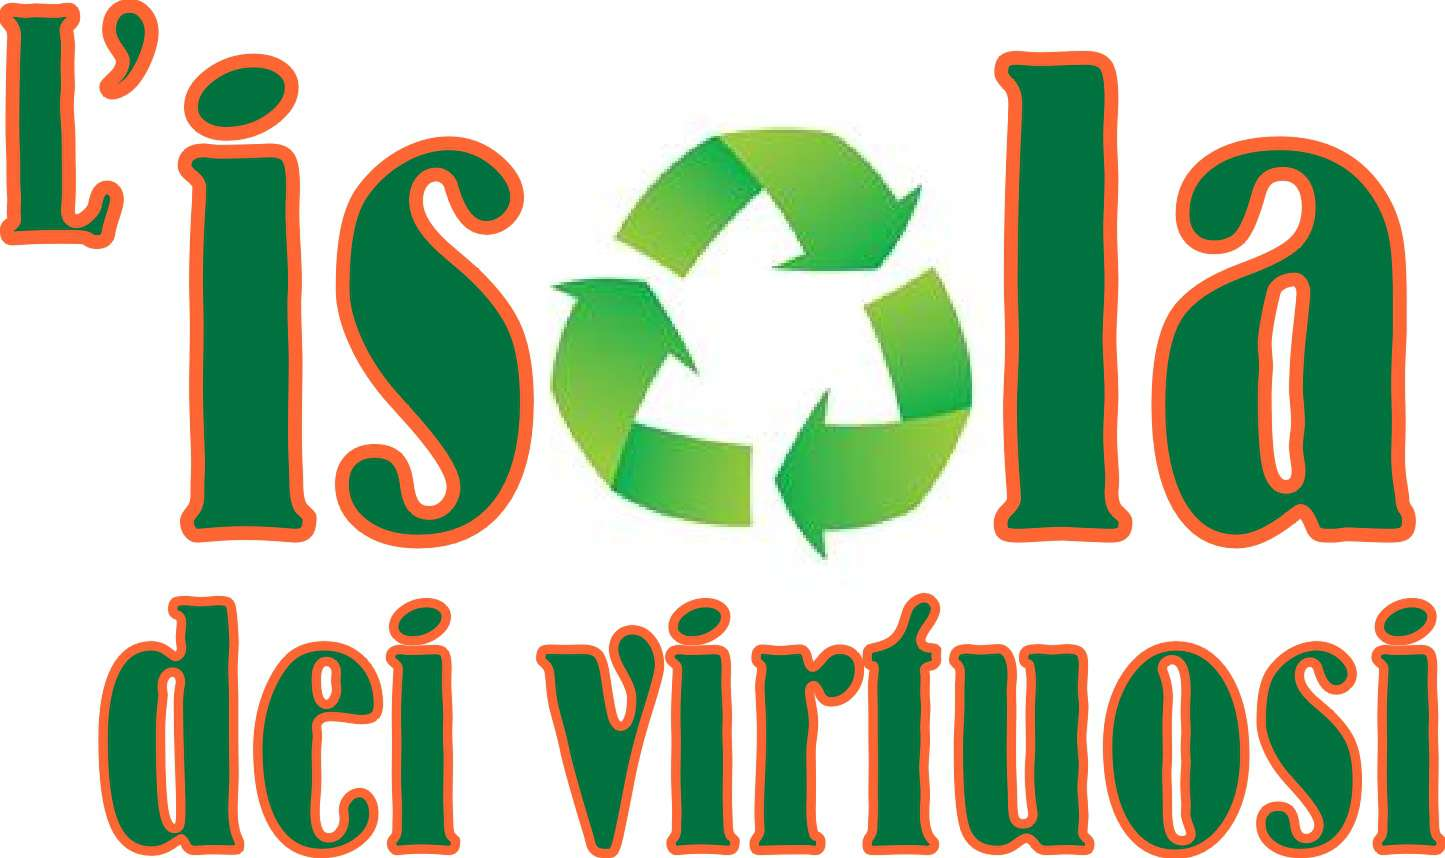 IsolaVirtuosi_logo.jpg